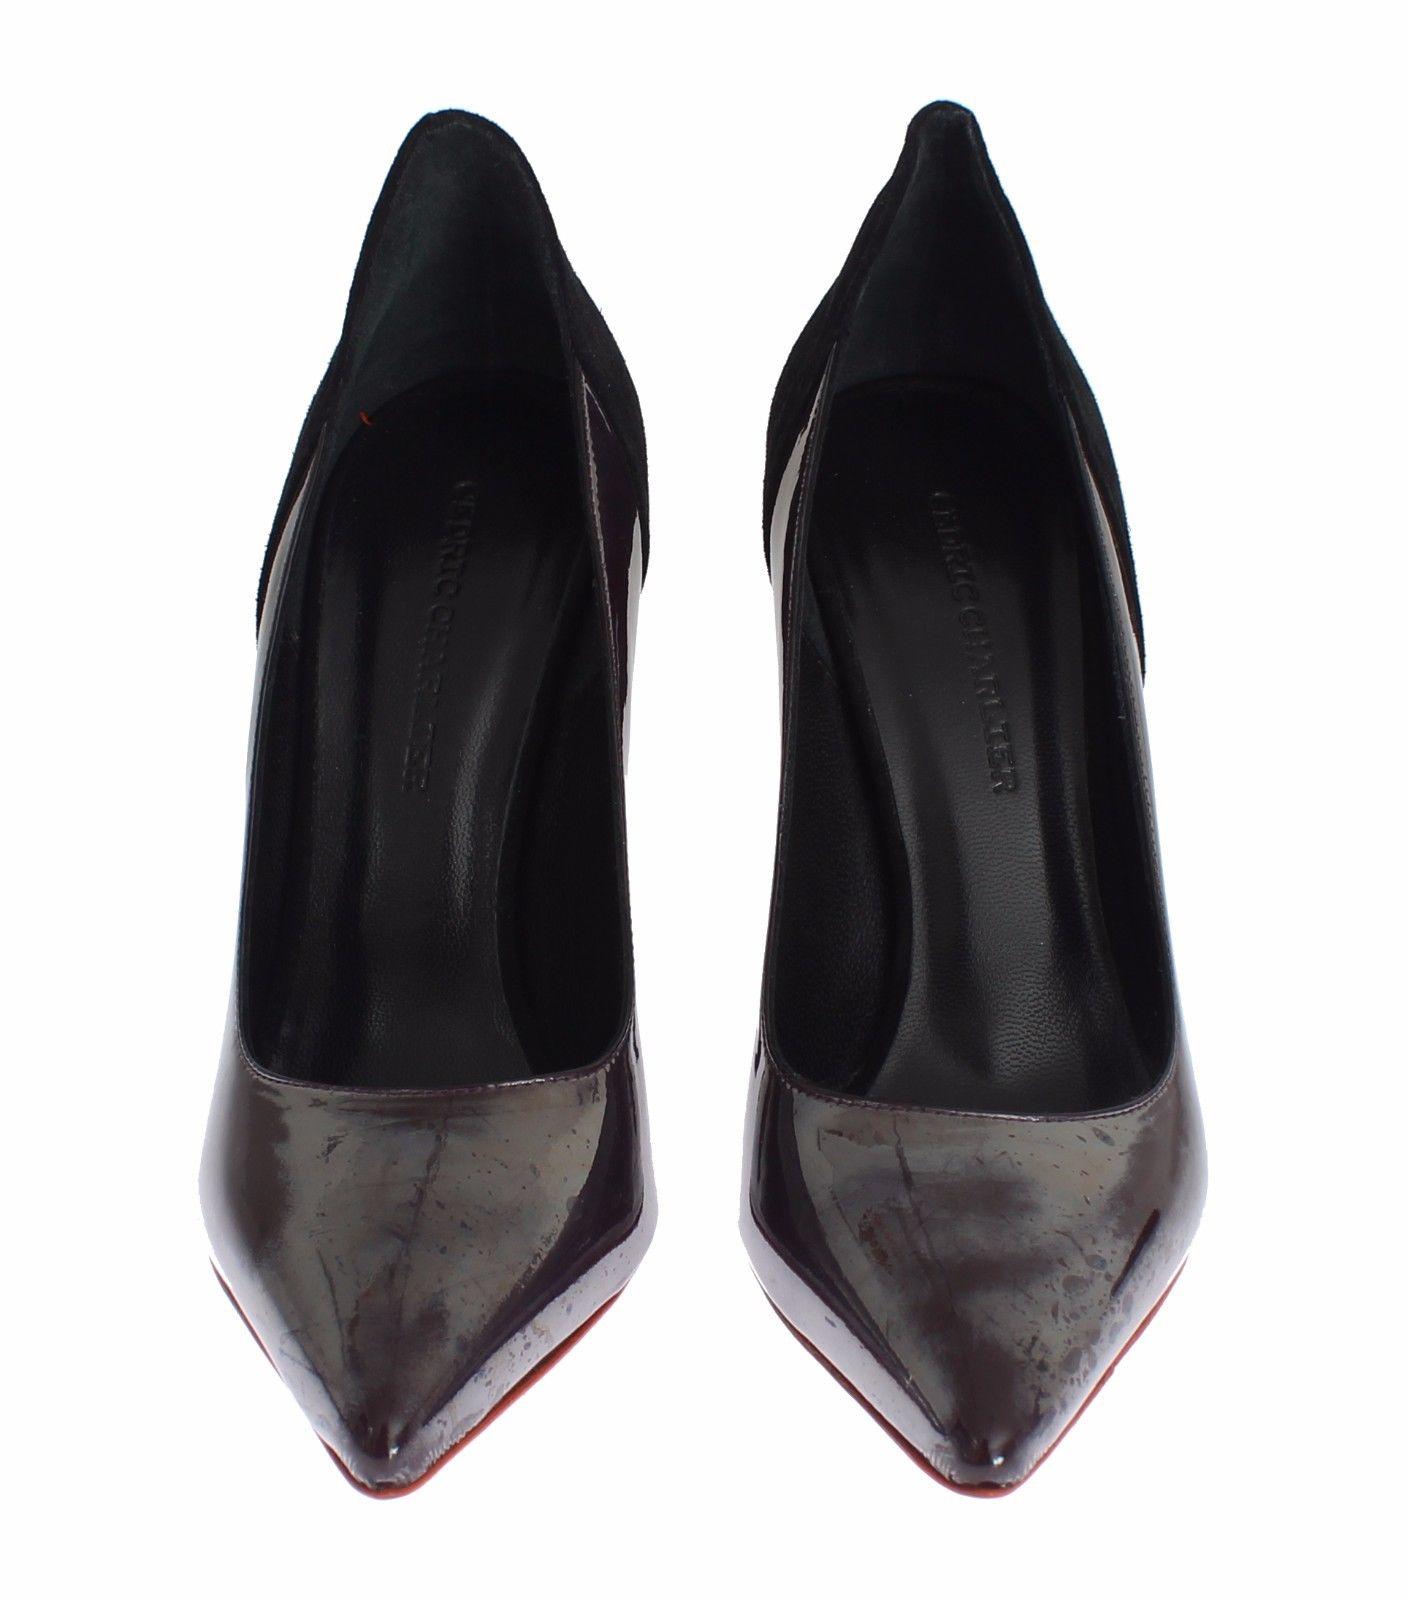 Cédric Charlier Women's Leather Suede Pumps Gray MOM26010 - EU41/US10.5